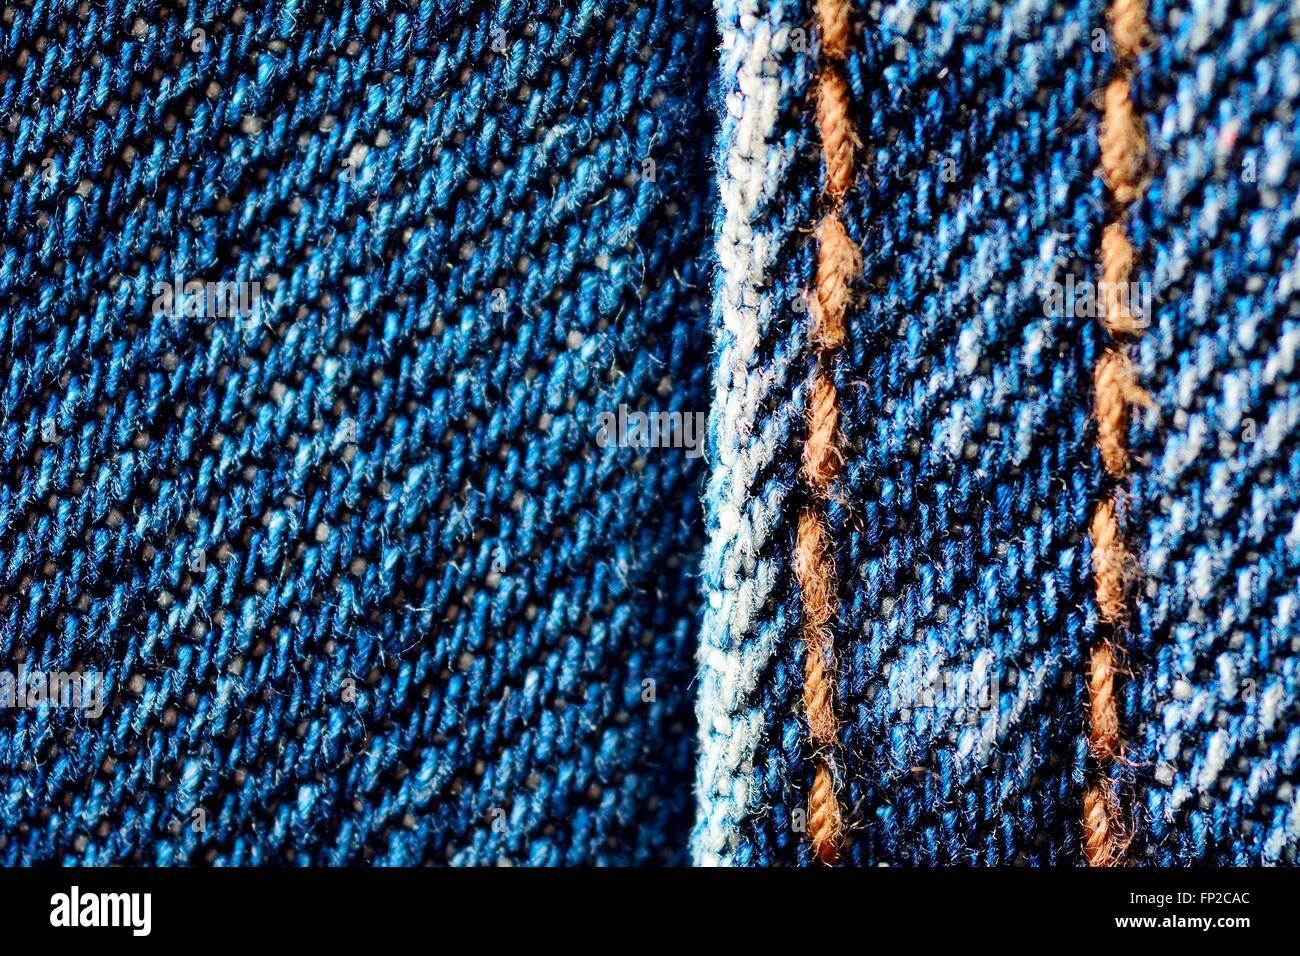 40cd69a89378a Blue jeans macro. Tejido Jeans textura. Costura en jeans Foto ...